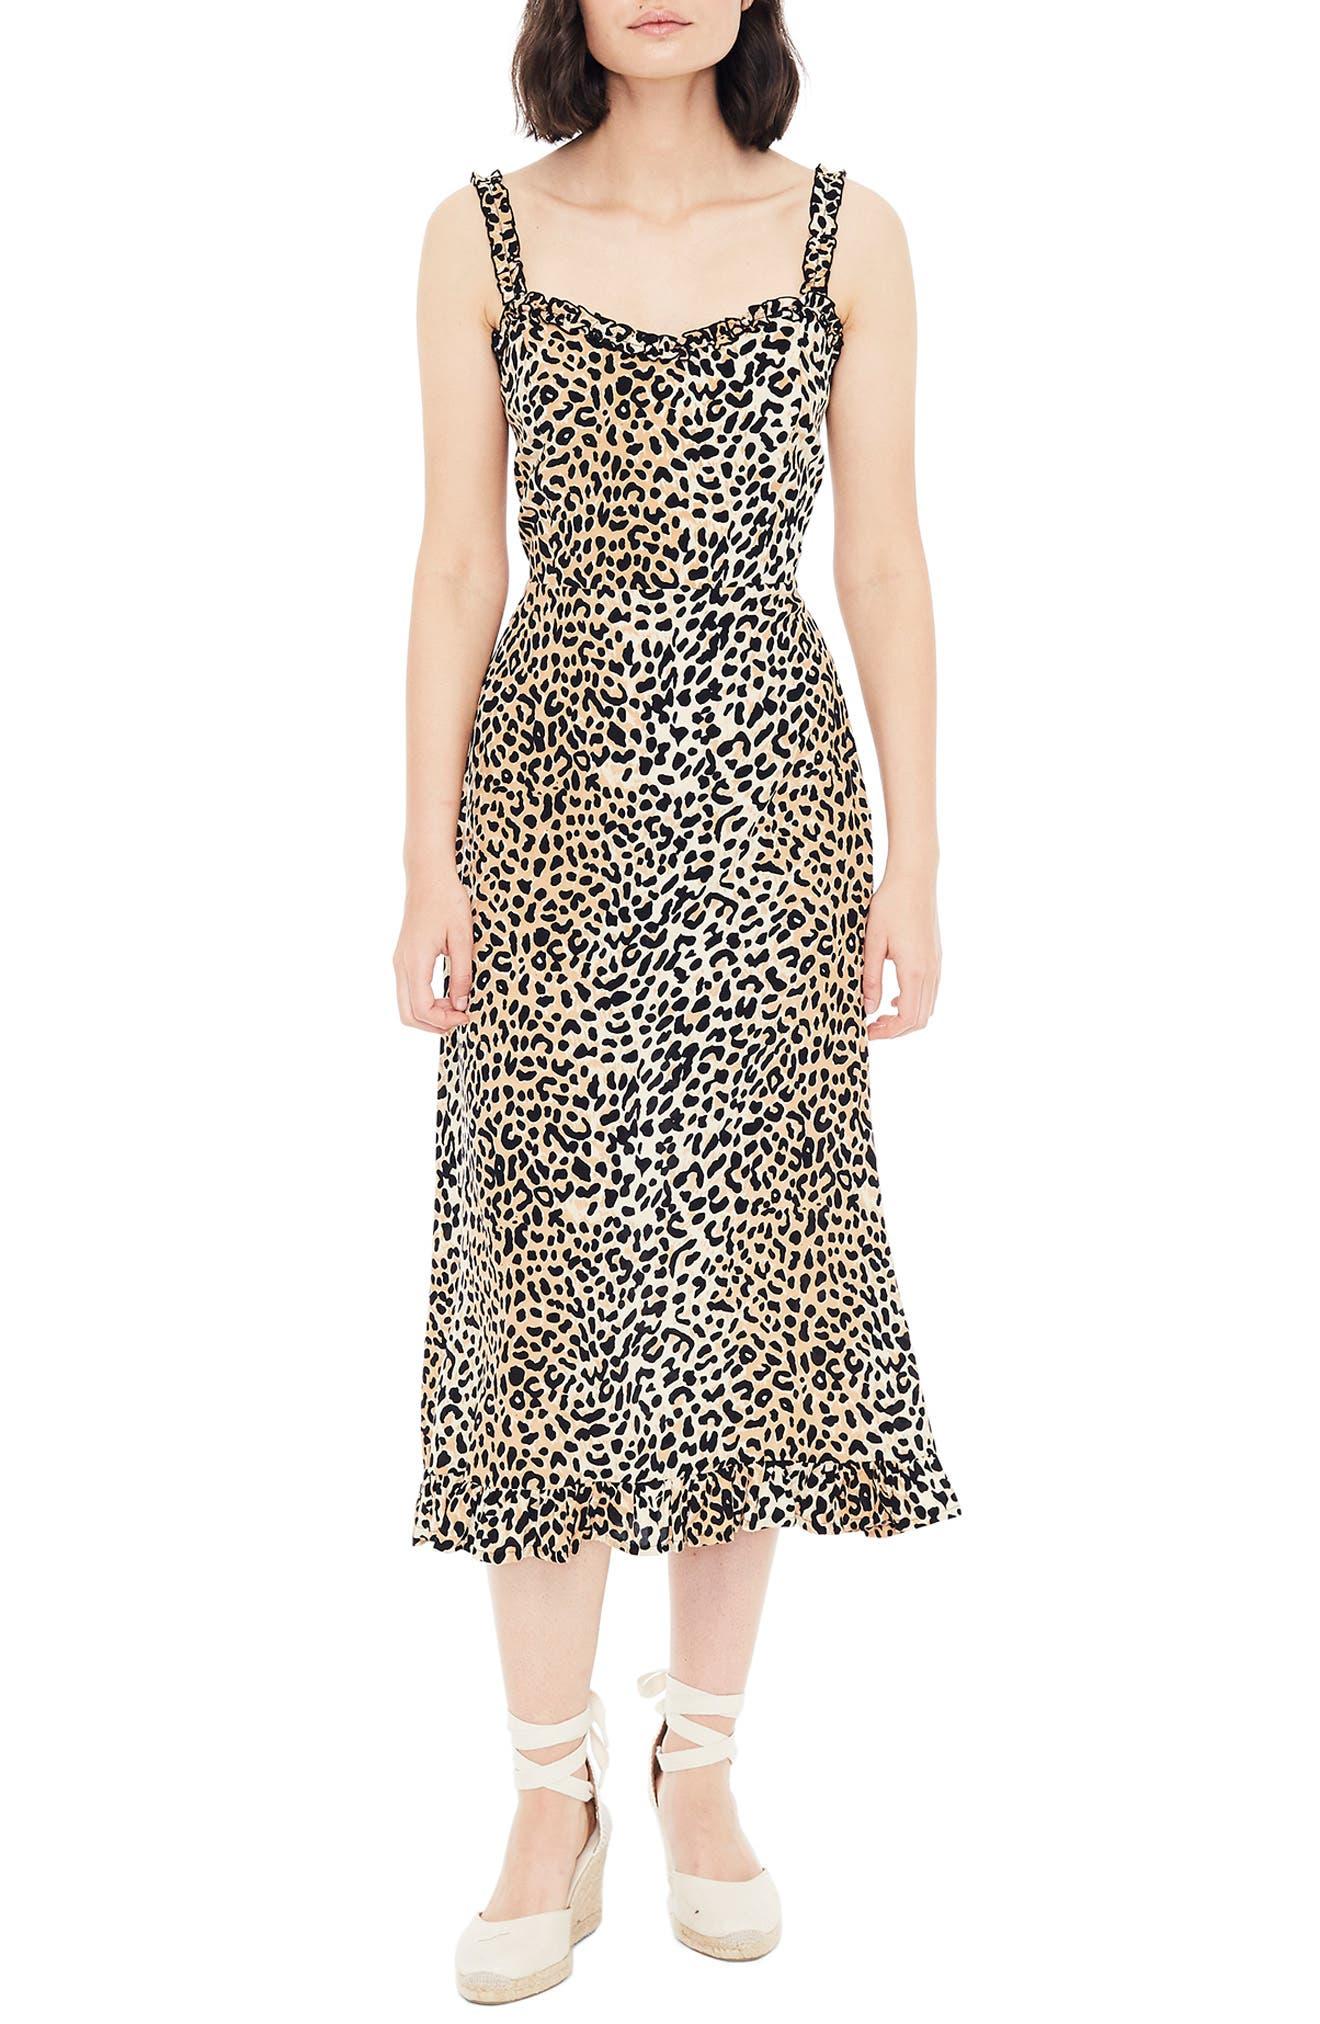 Faithfull The Brand Noemie Animal Print Midi Dress, Brown